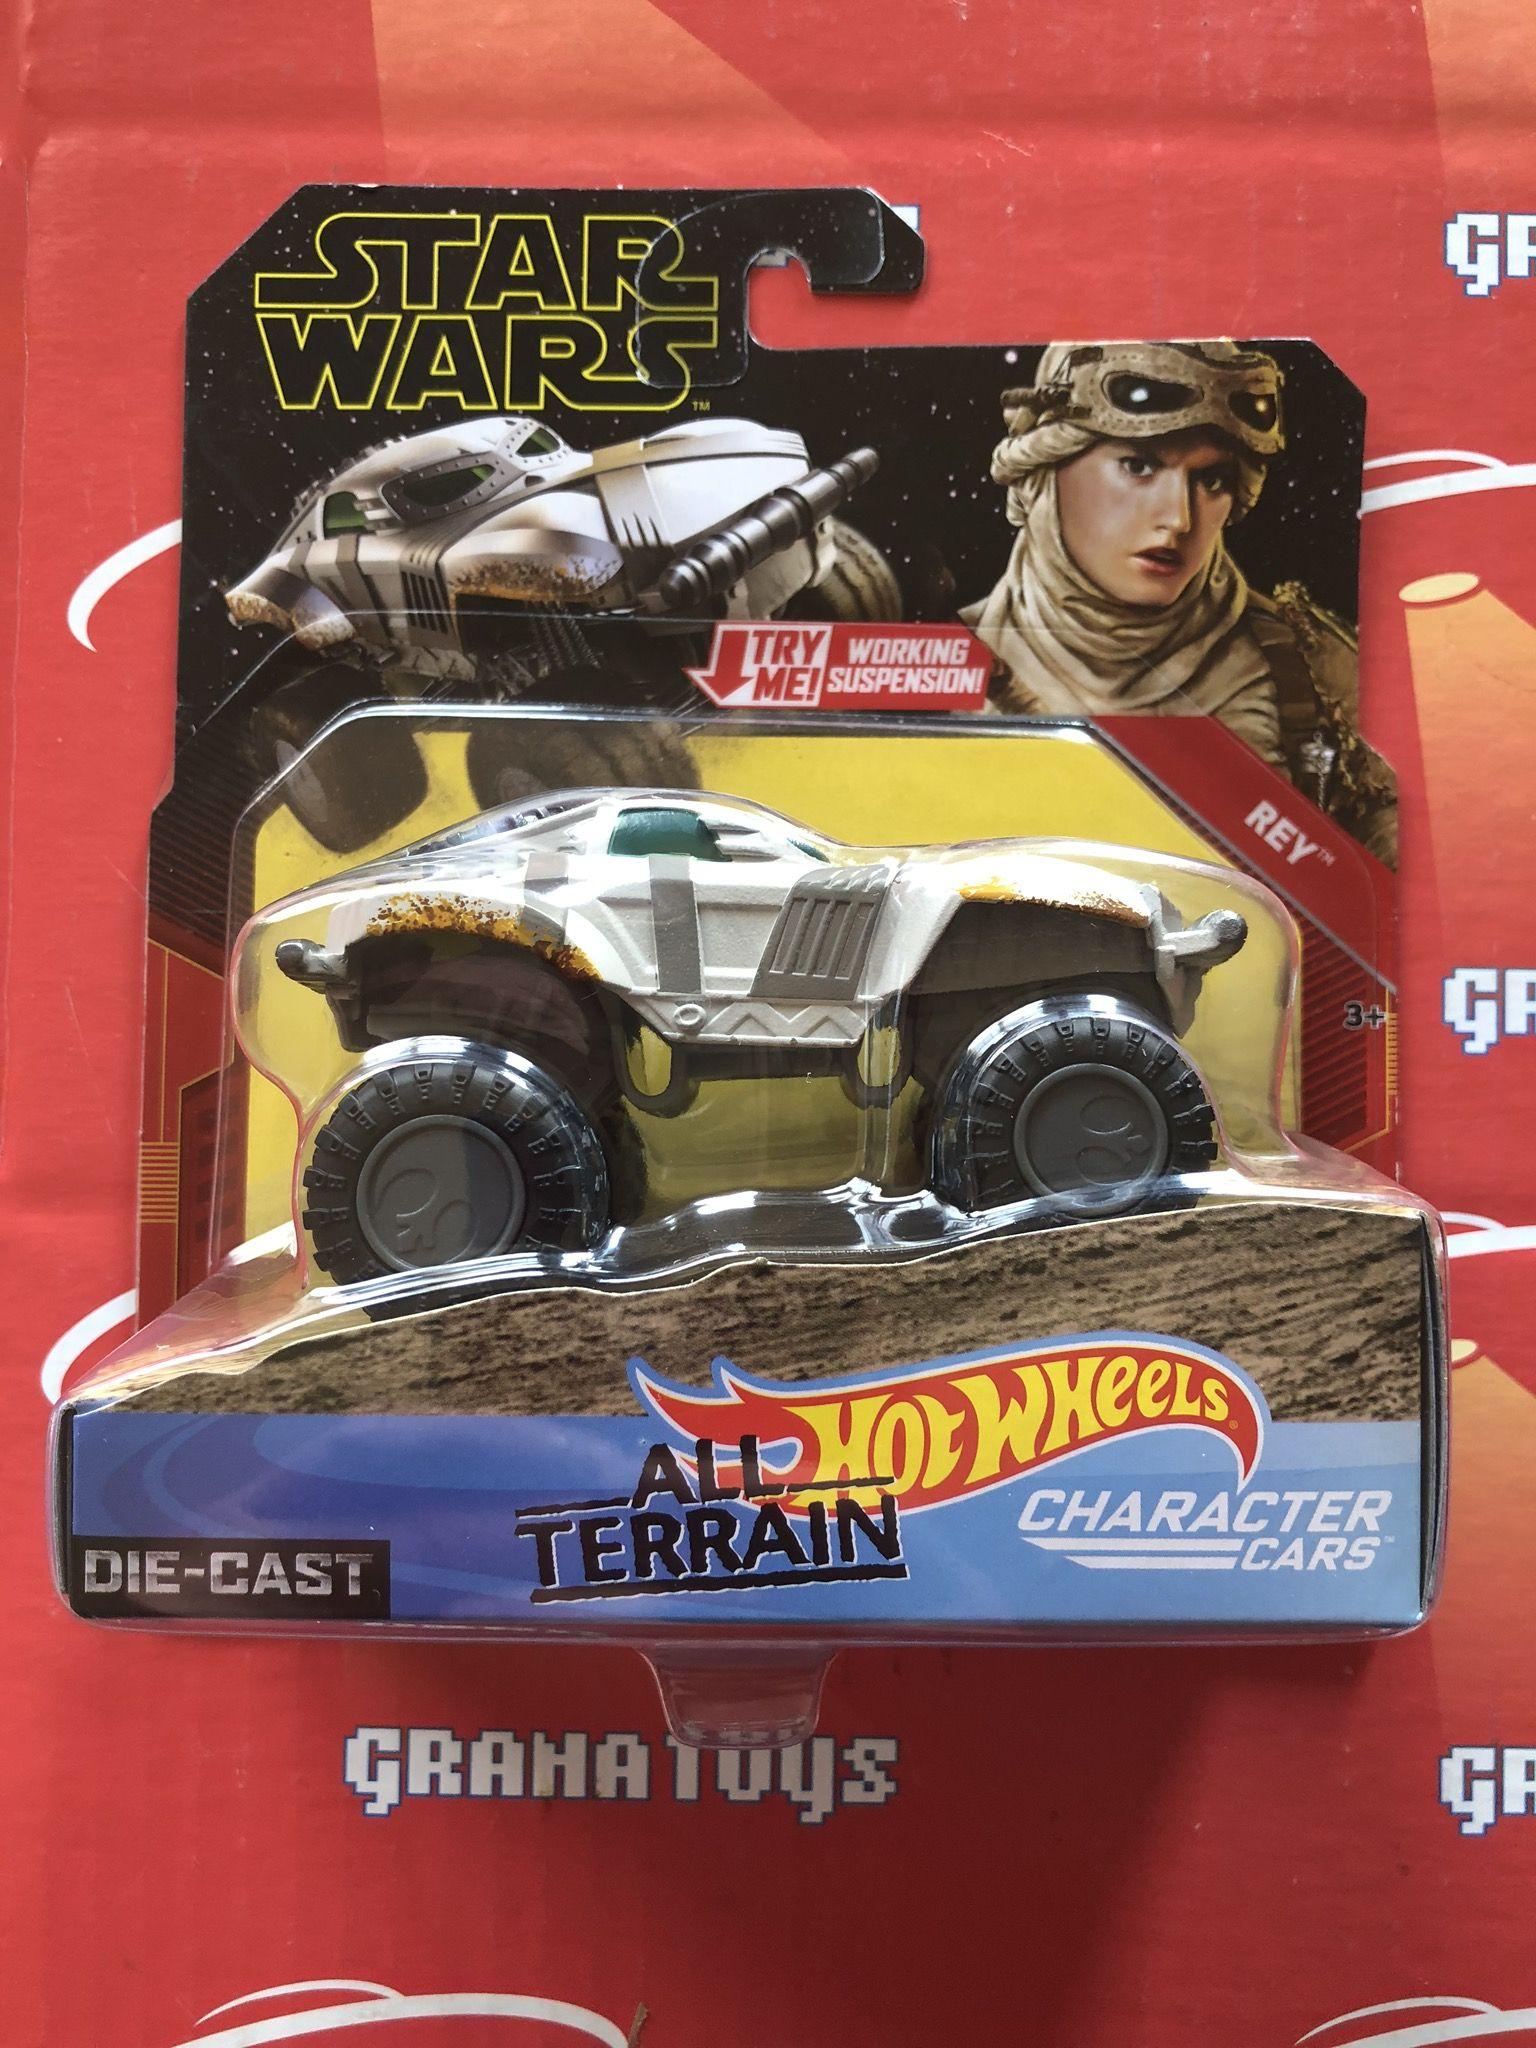 Rey 2019 Hot Wheels Star Wars Rise Of Skywalker All Terrain Character Cars Mix A Grana Toys Hot Wheels Character Star Wars